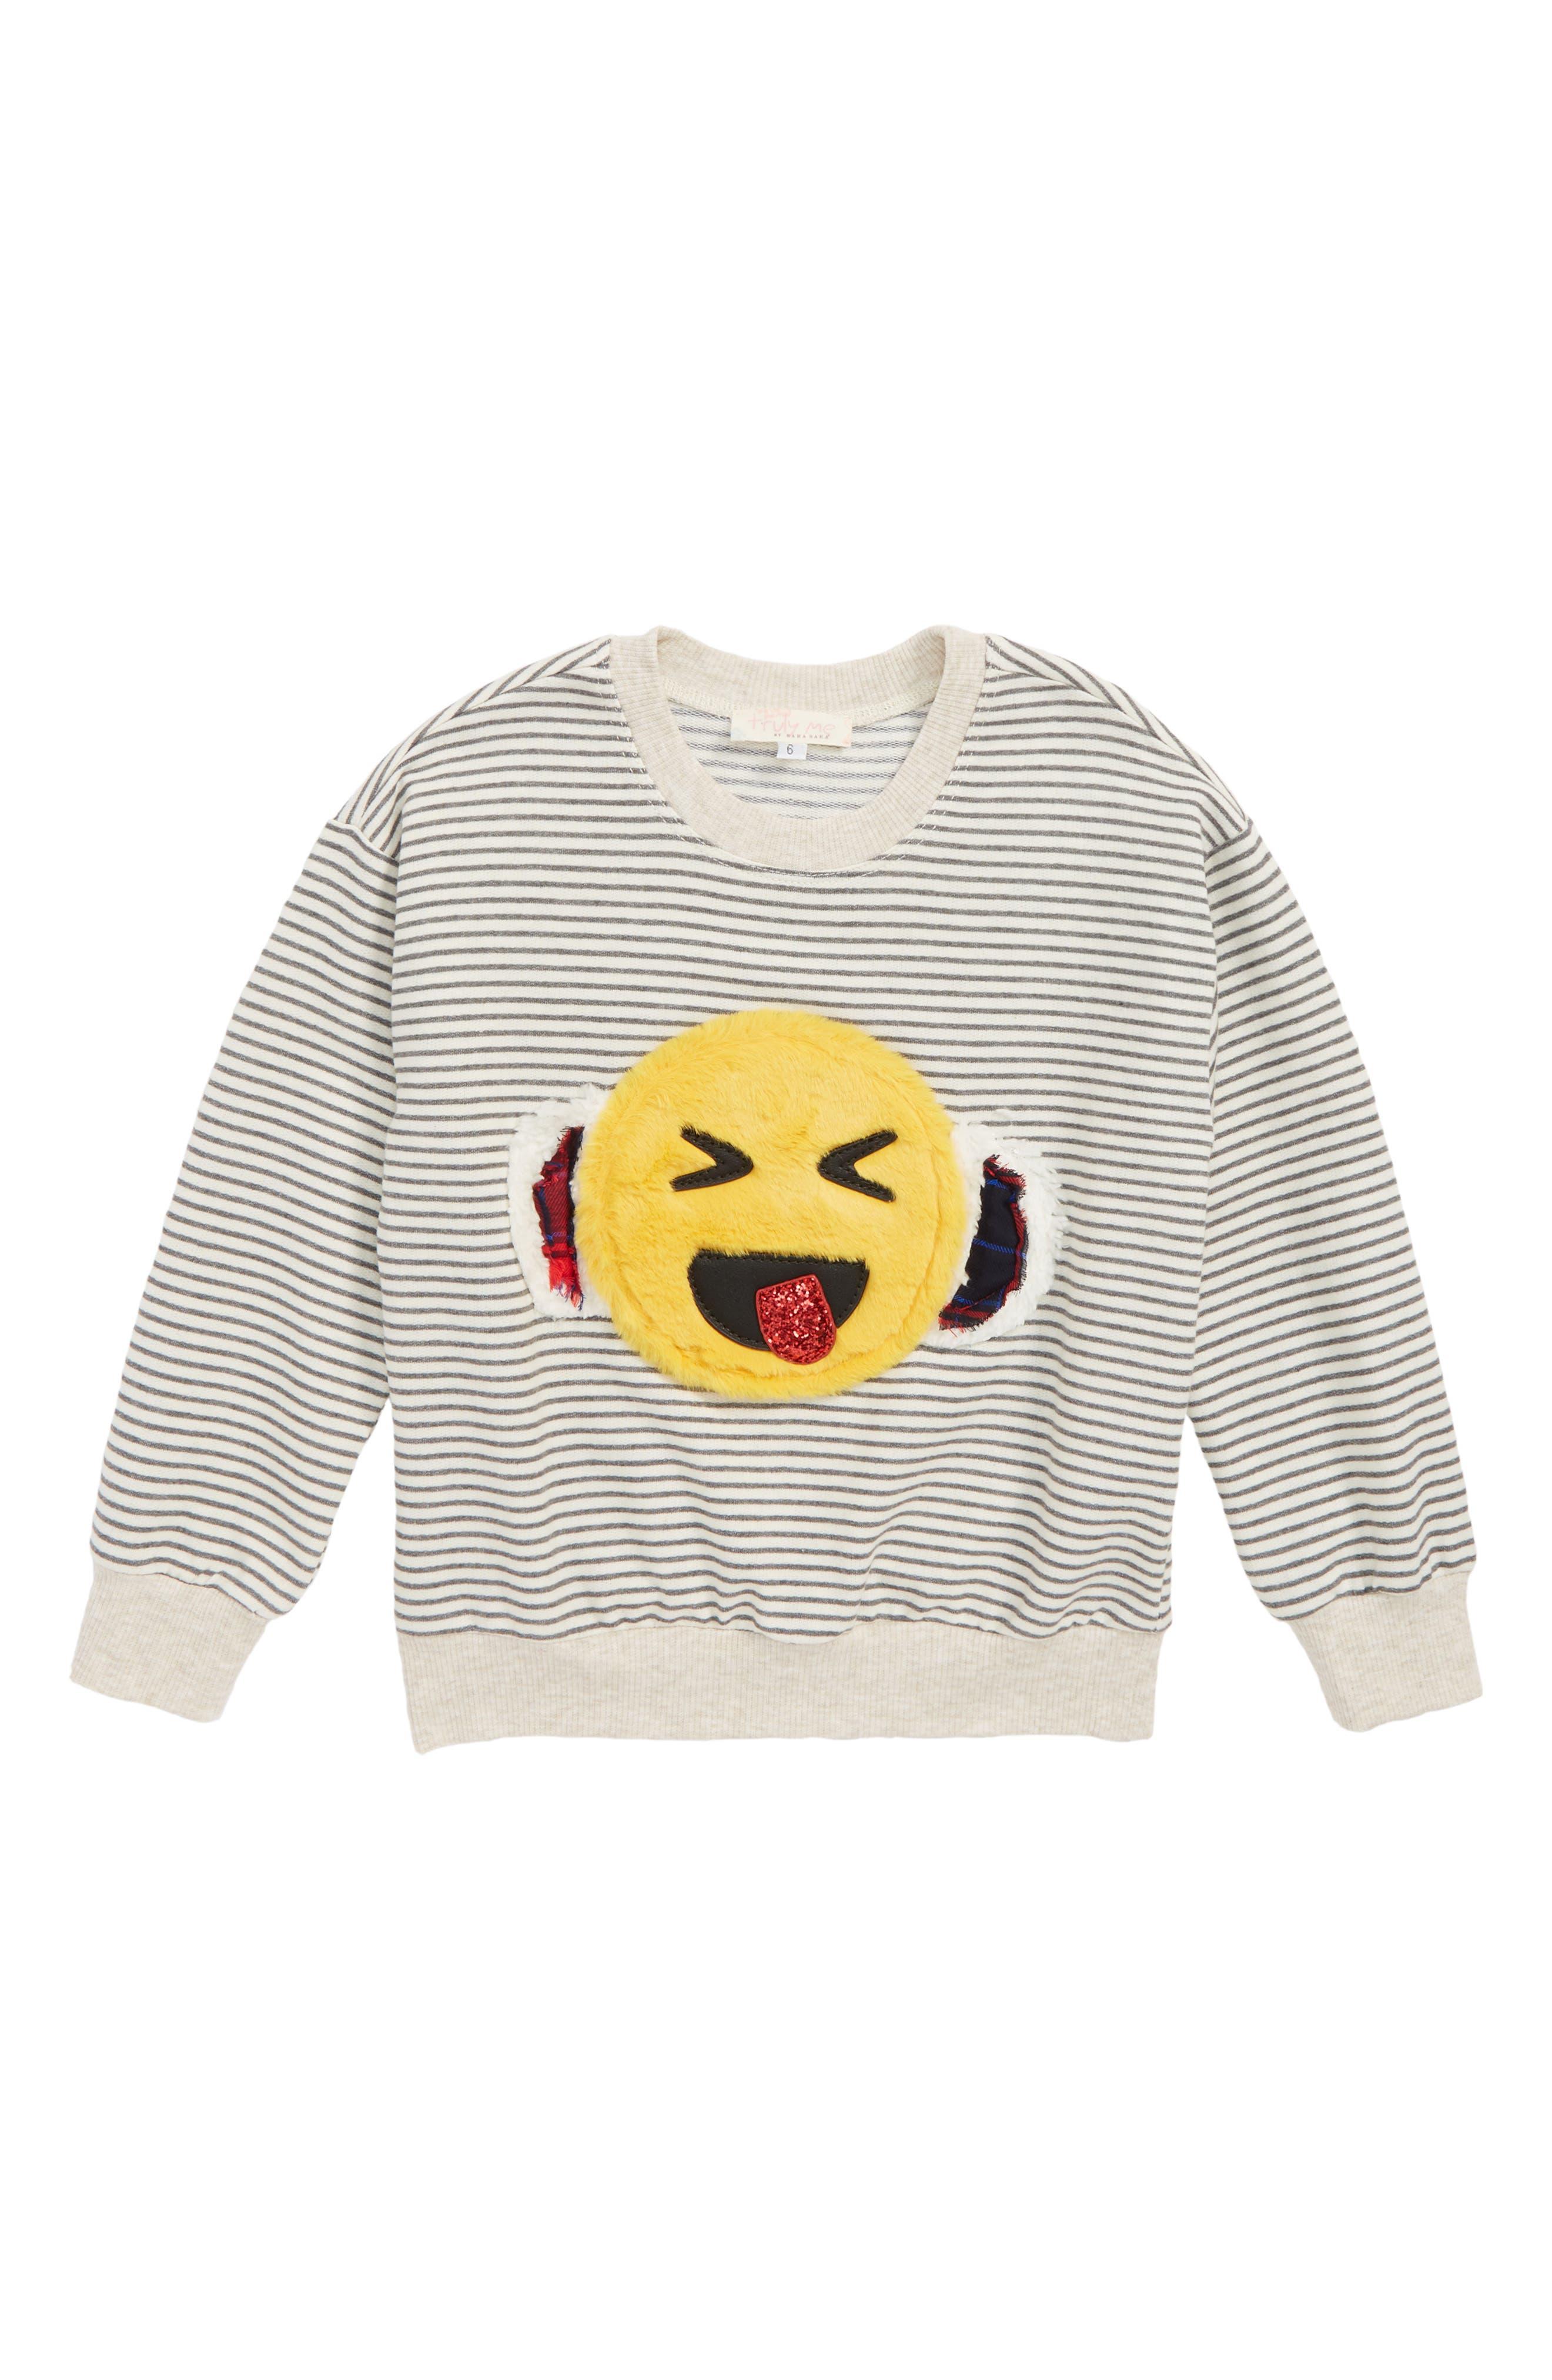 TRULY ME,                             Faux Fur Emoji Stripe Sweatshirt,                             Main thumbnail 1, color,                             065